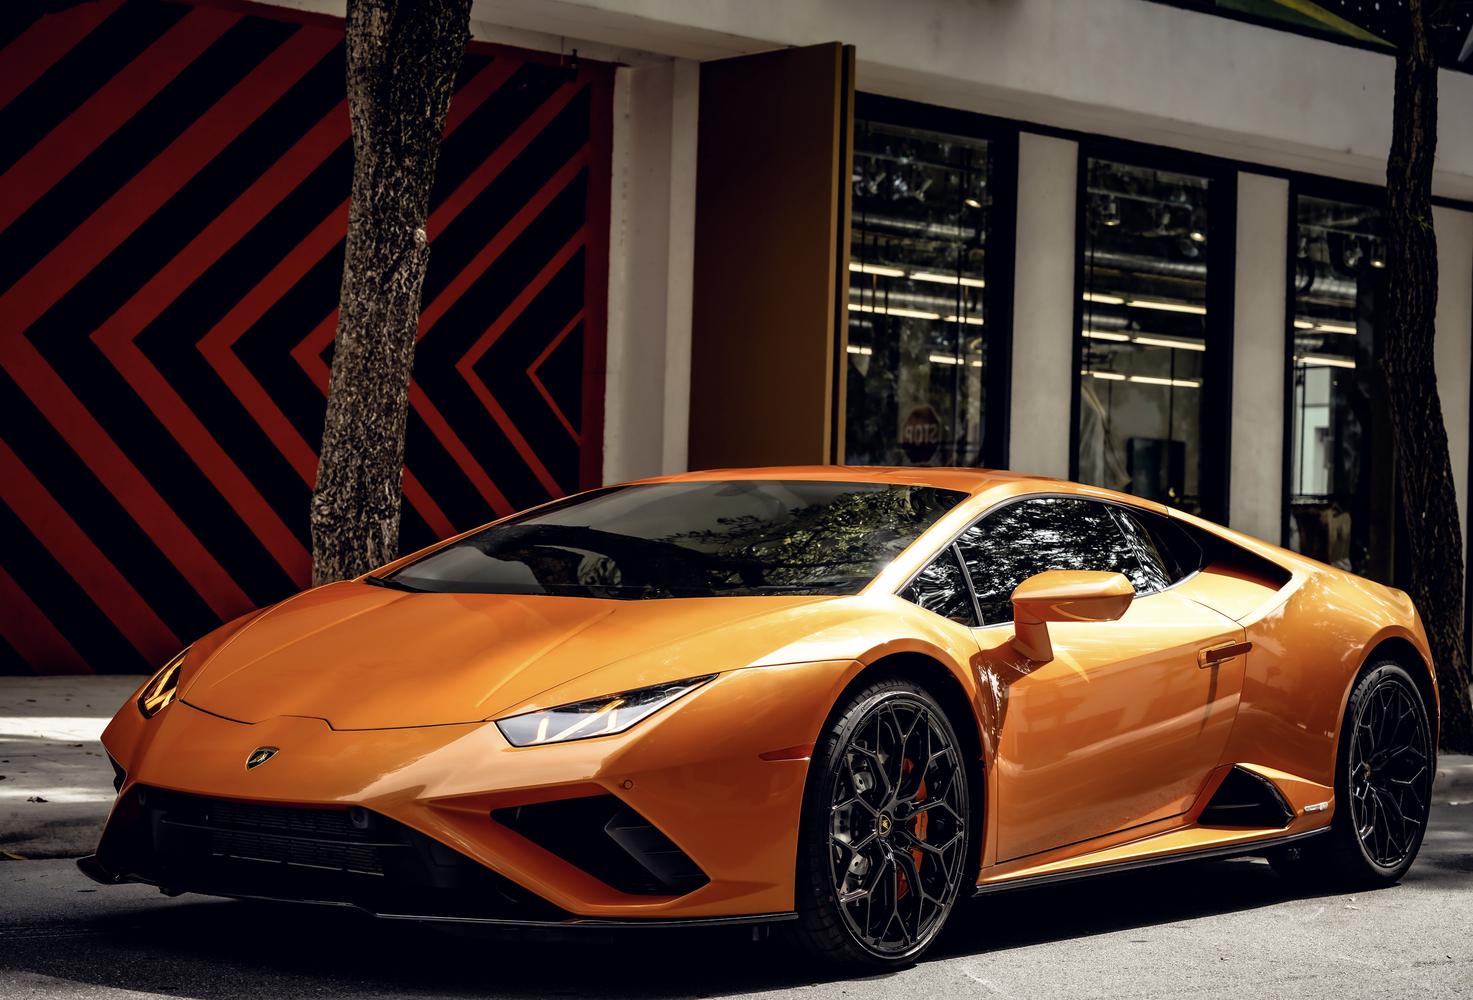 Image #4 of our  Lamborghini Huracan EVO Orange Coupe    In Miami Fort Lauderdale Palm Beach South Florida